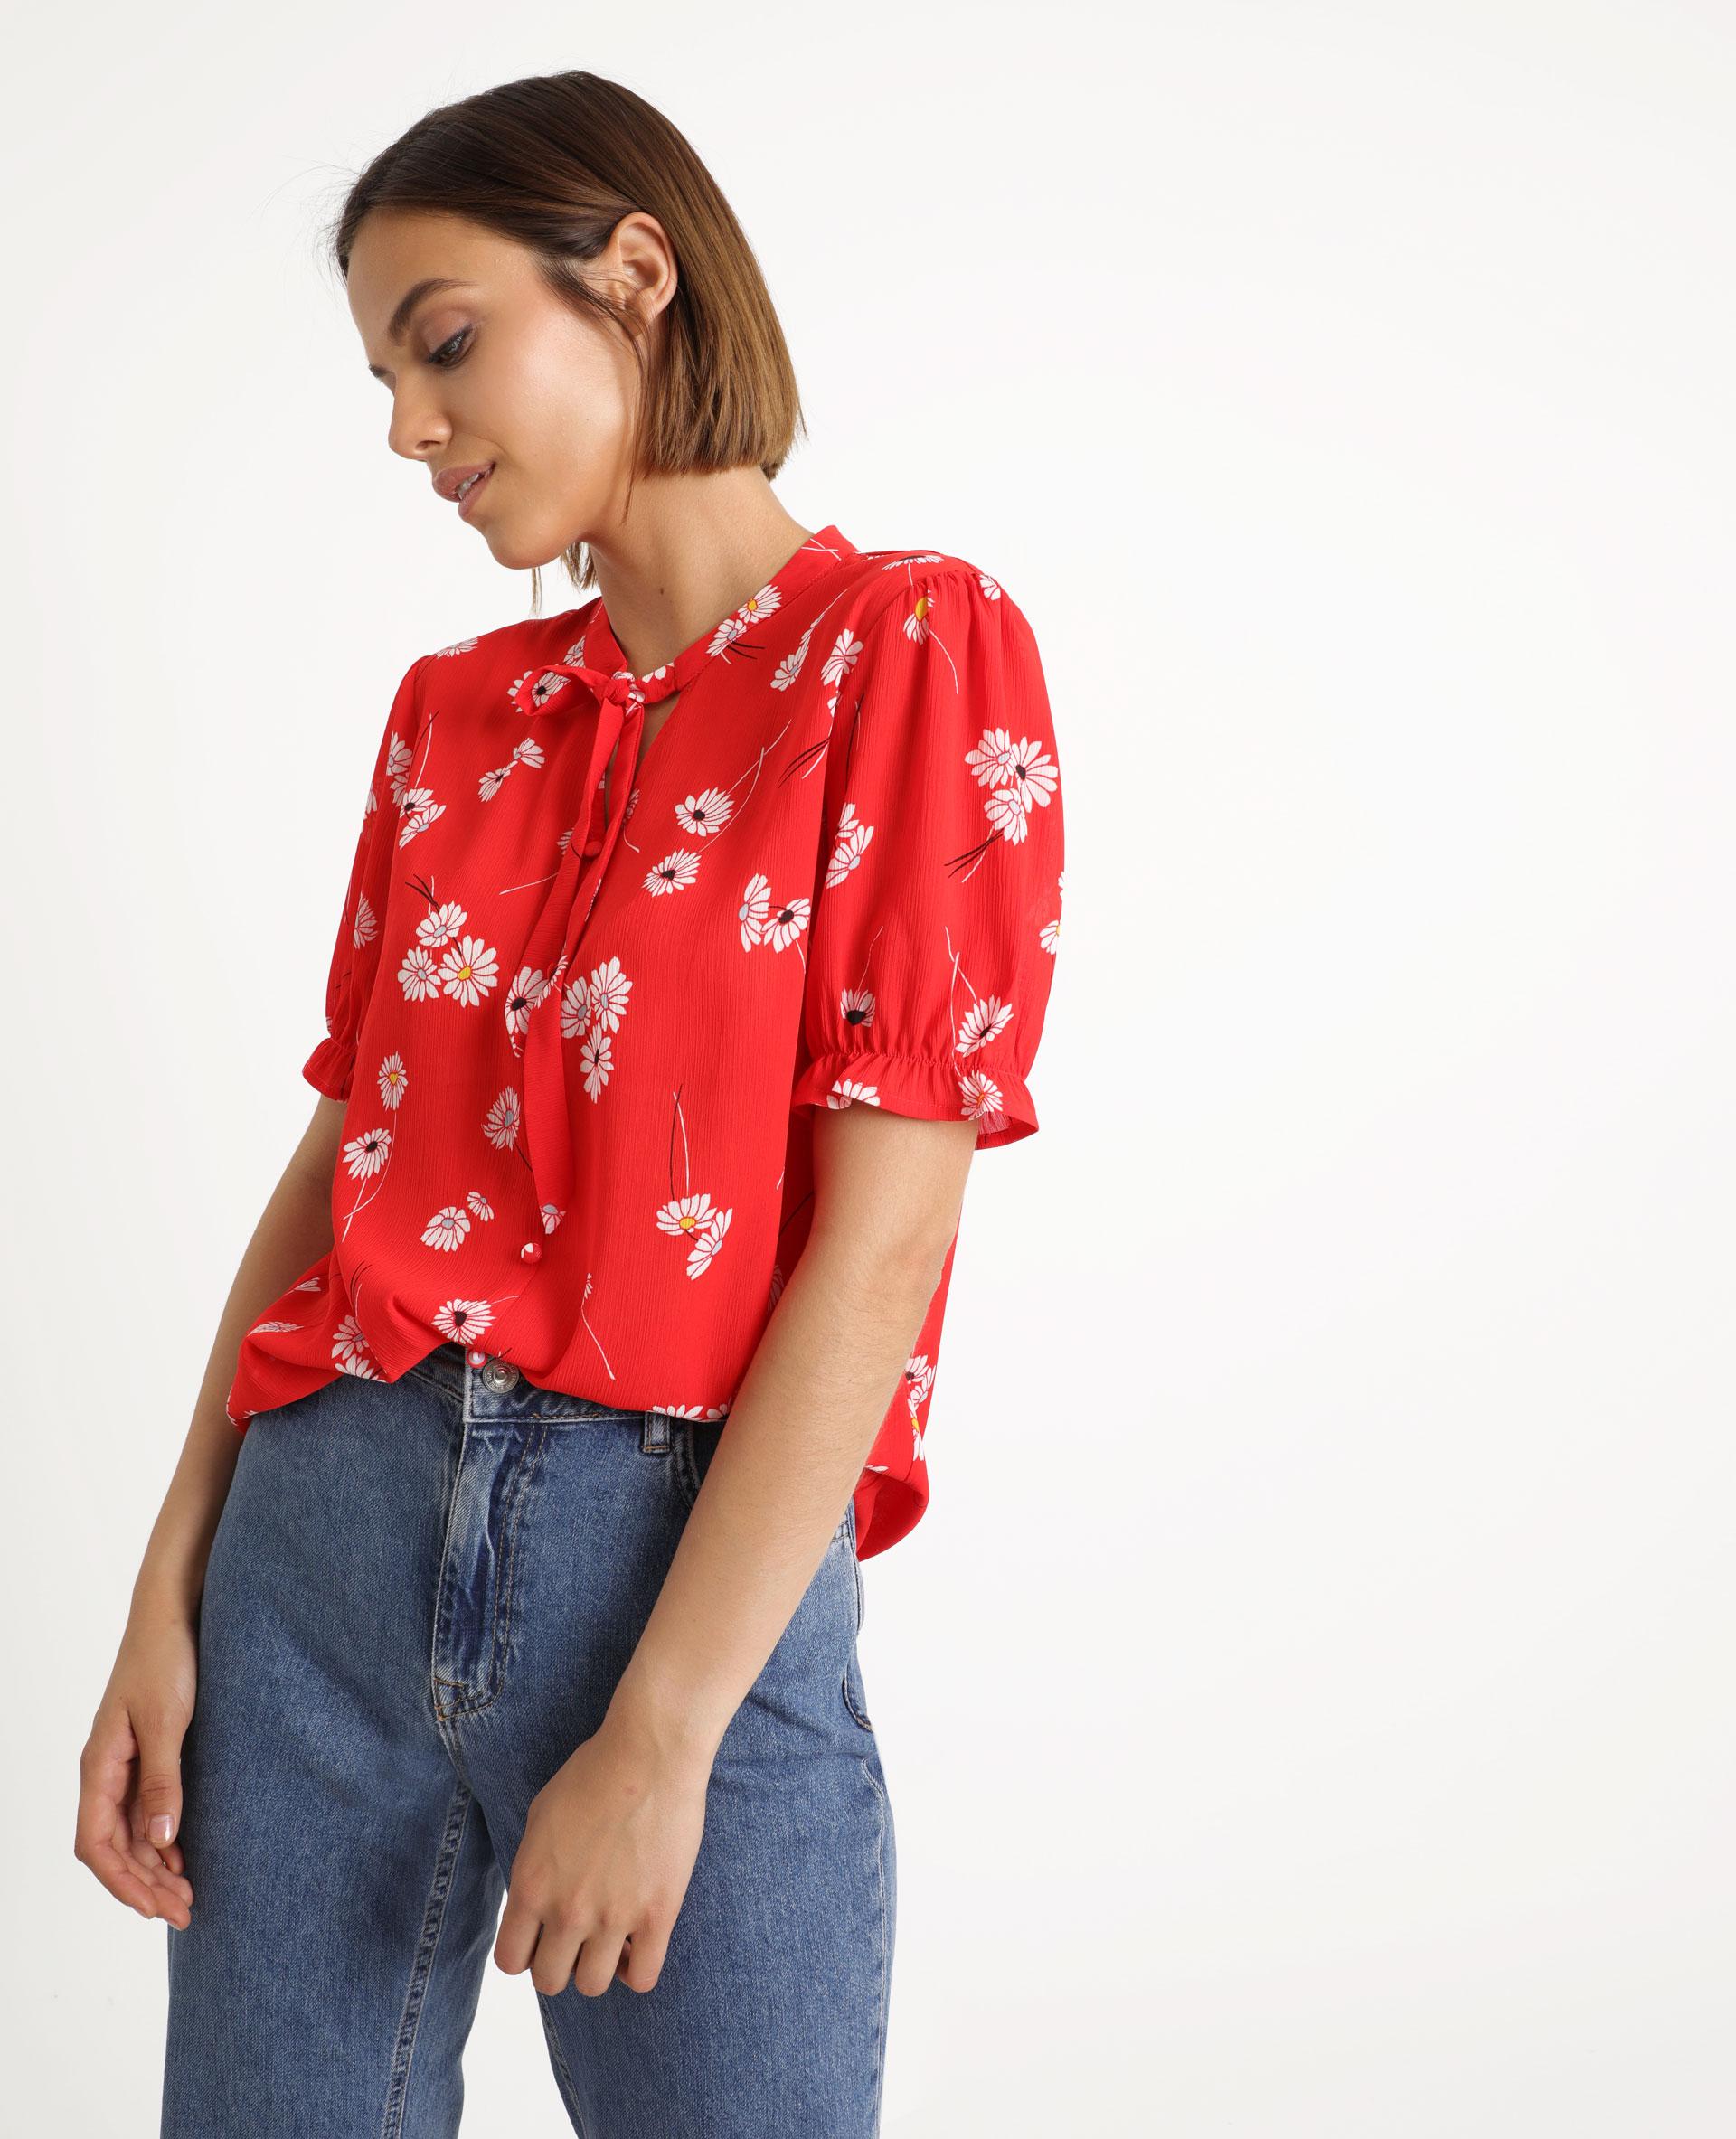 Chemisier fleuri rouge - Pimkie